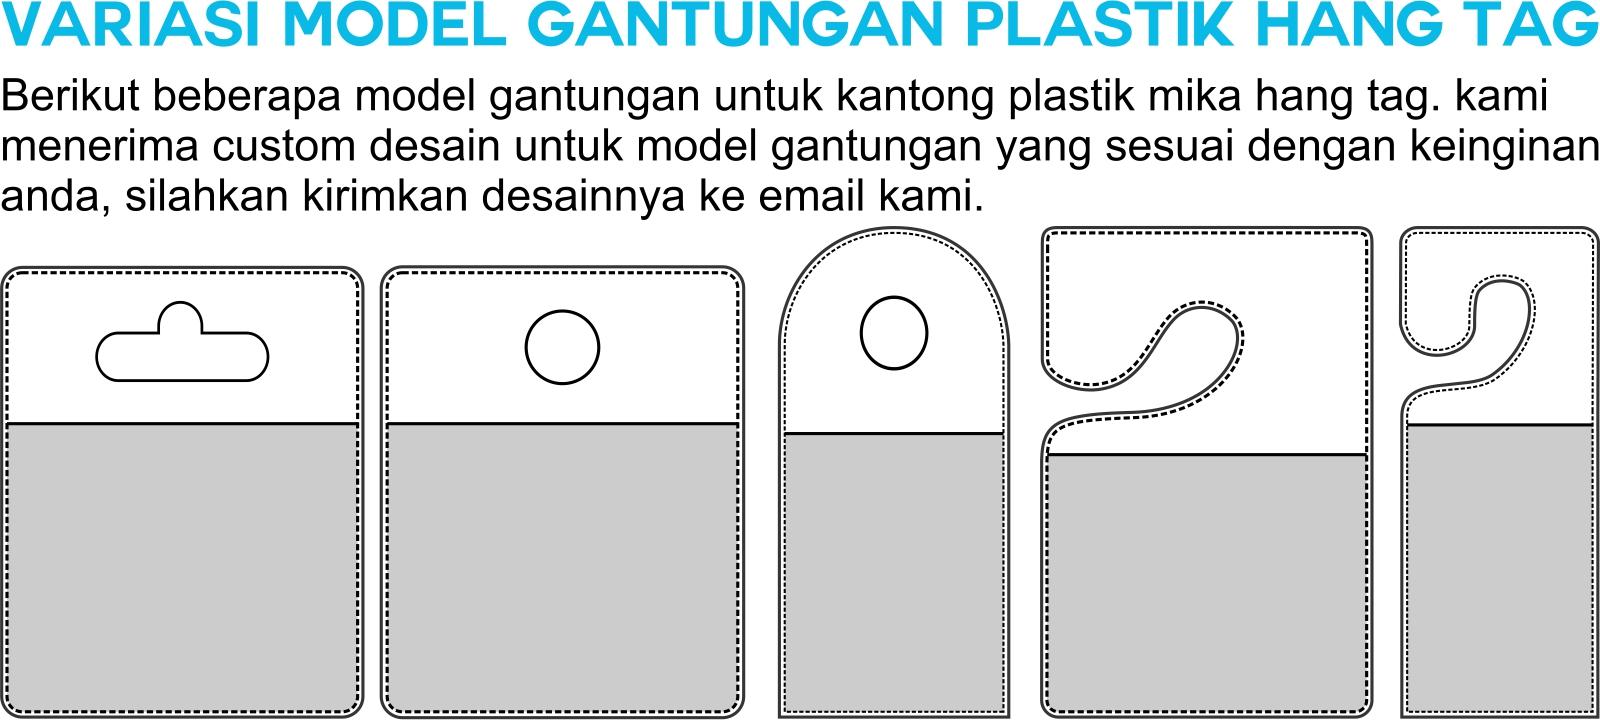 Kantong Plastik Mika PVC Hang Tag